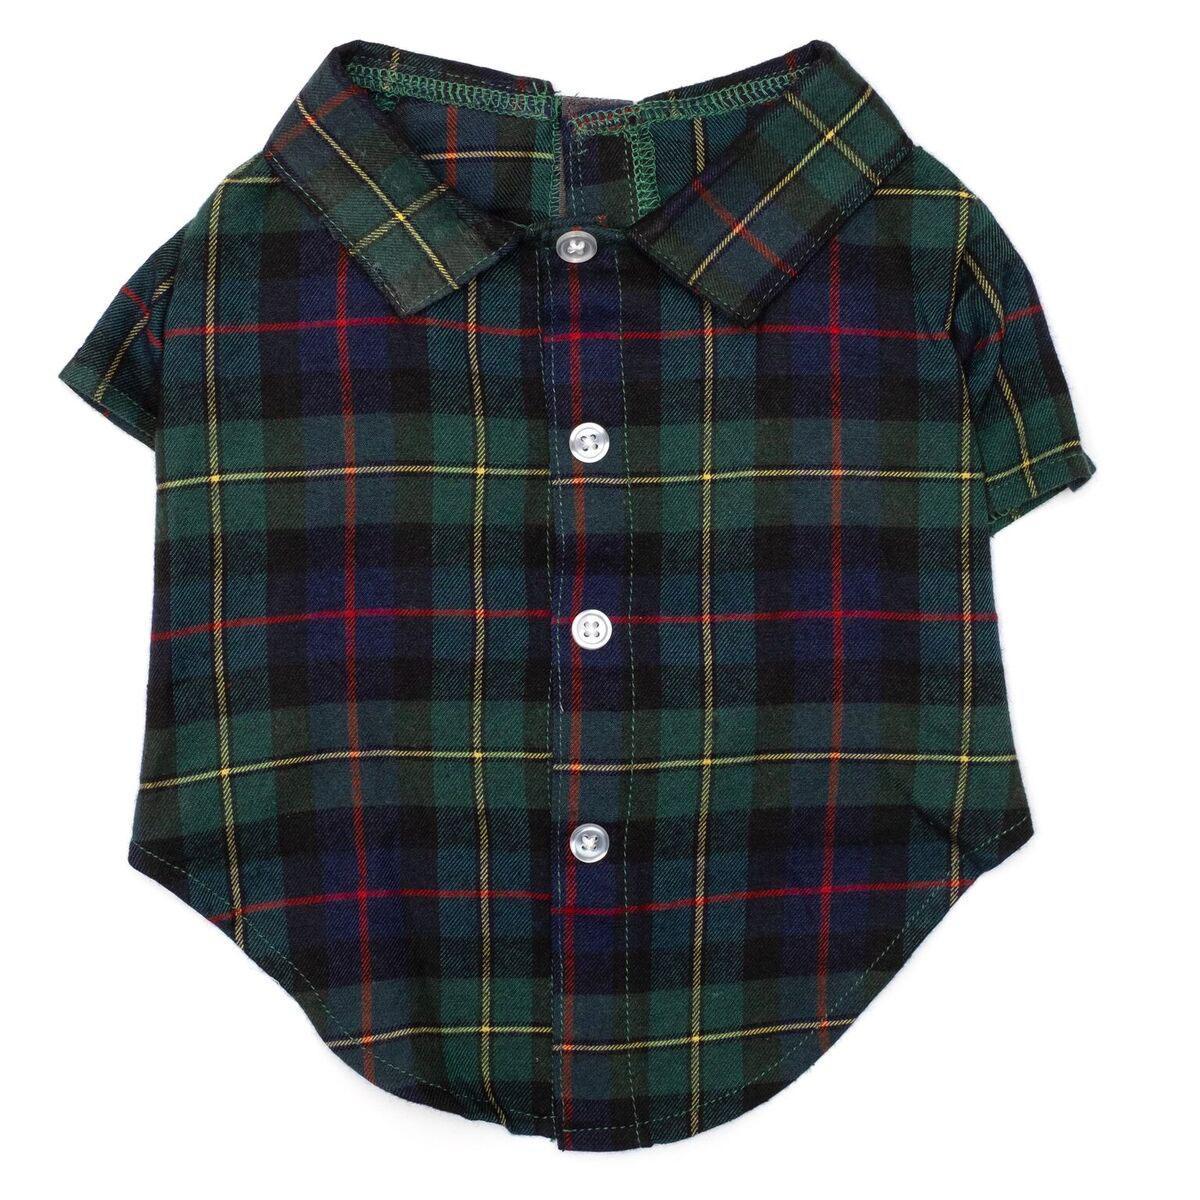 Worthy Dog Macleod Tartan Flannel Dog Shirt